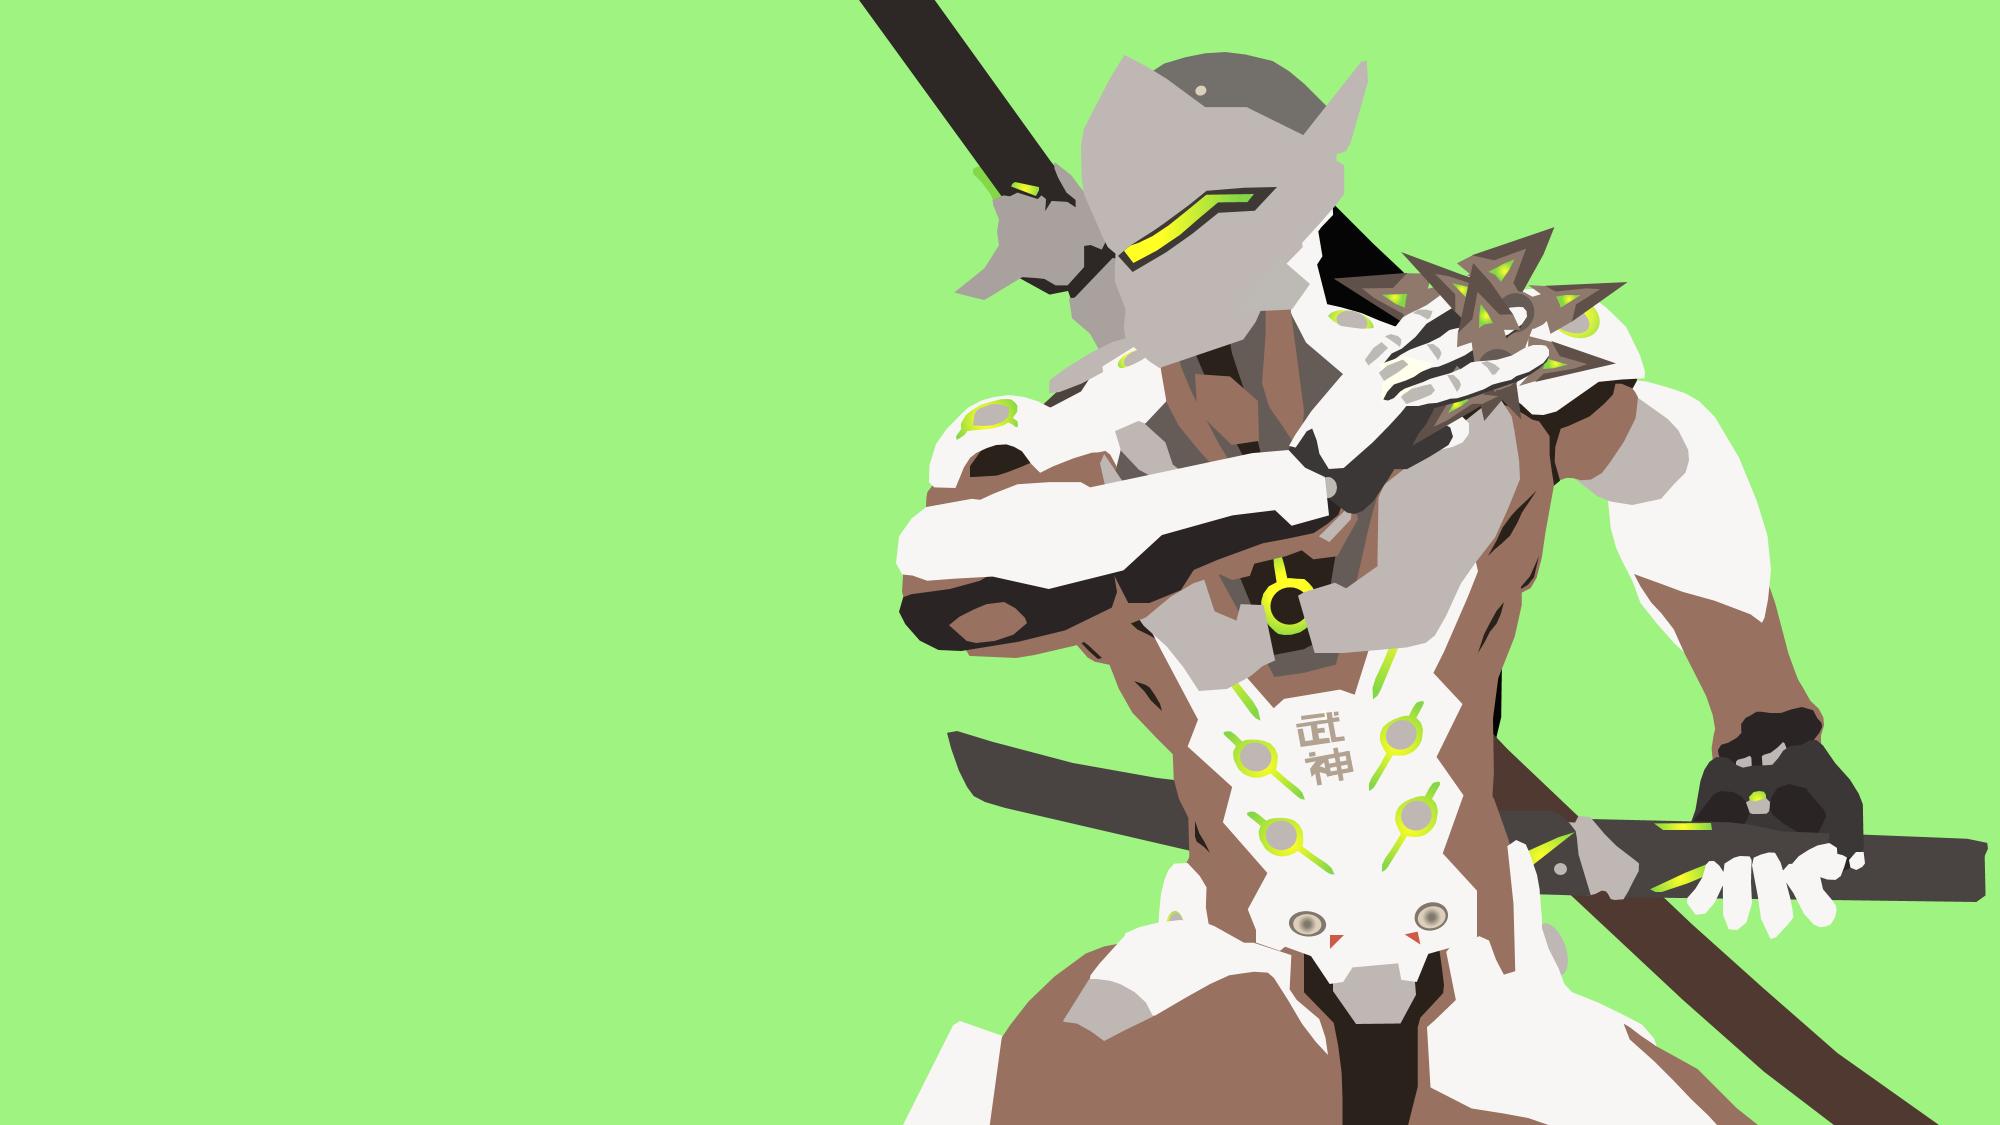 Genji from Overwatch by Reverendtundra on DeviantArt.